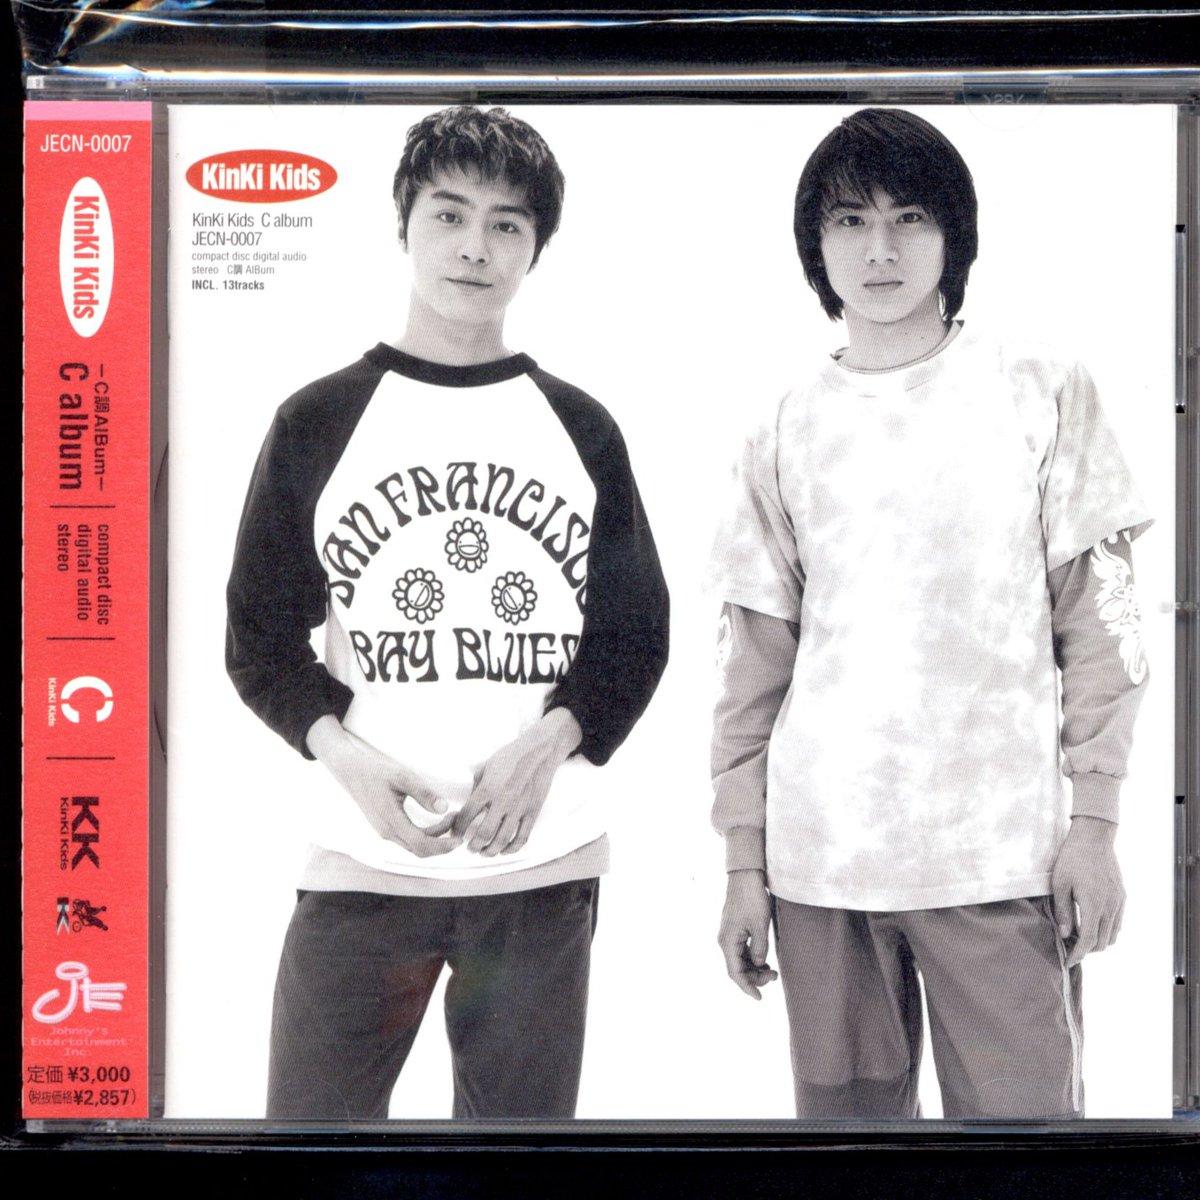 test ツイッターメディア - やめないで,PURE(Album Version) / KinKi Kids #nowplaying   作詞:伊達歩(伊集院静) 作曲:筒美京平  1999年8月4日発売「C album」より https://t.co/Fl7Ogpjj0I